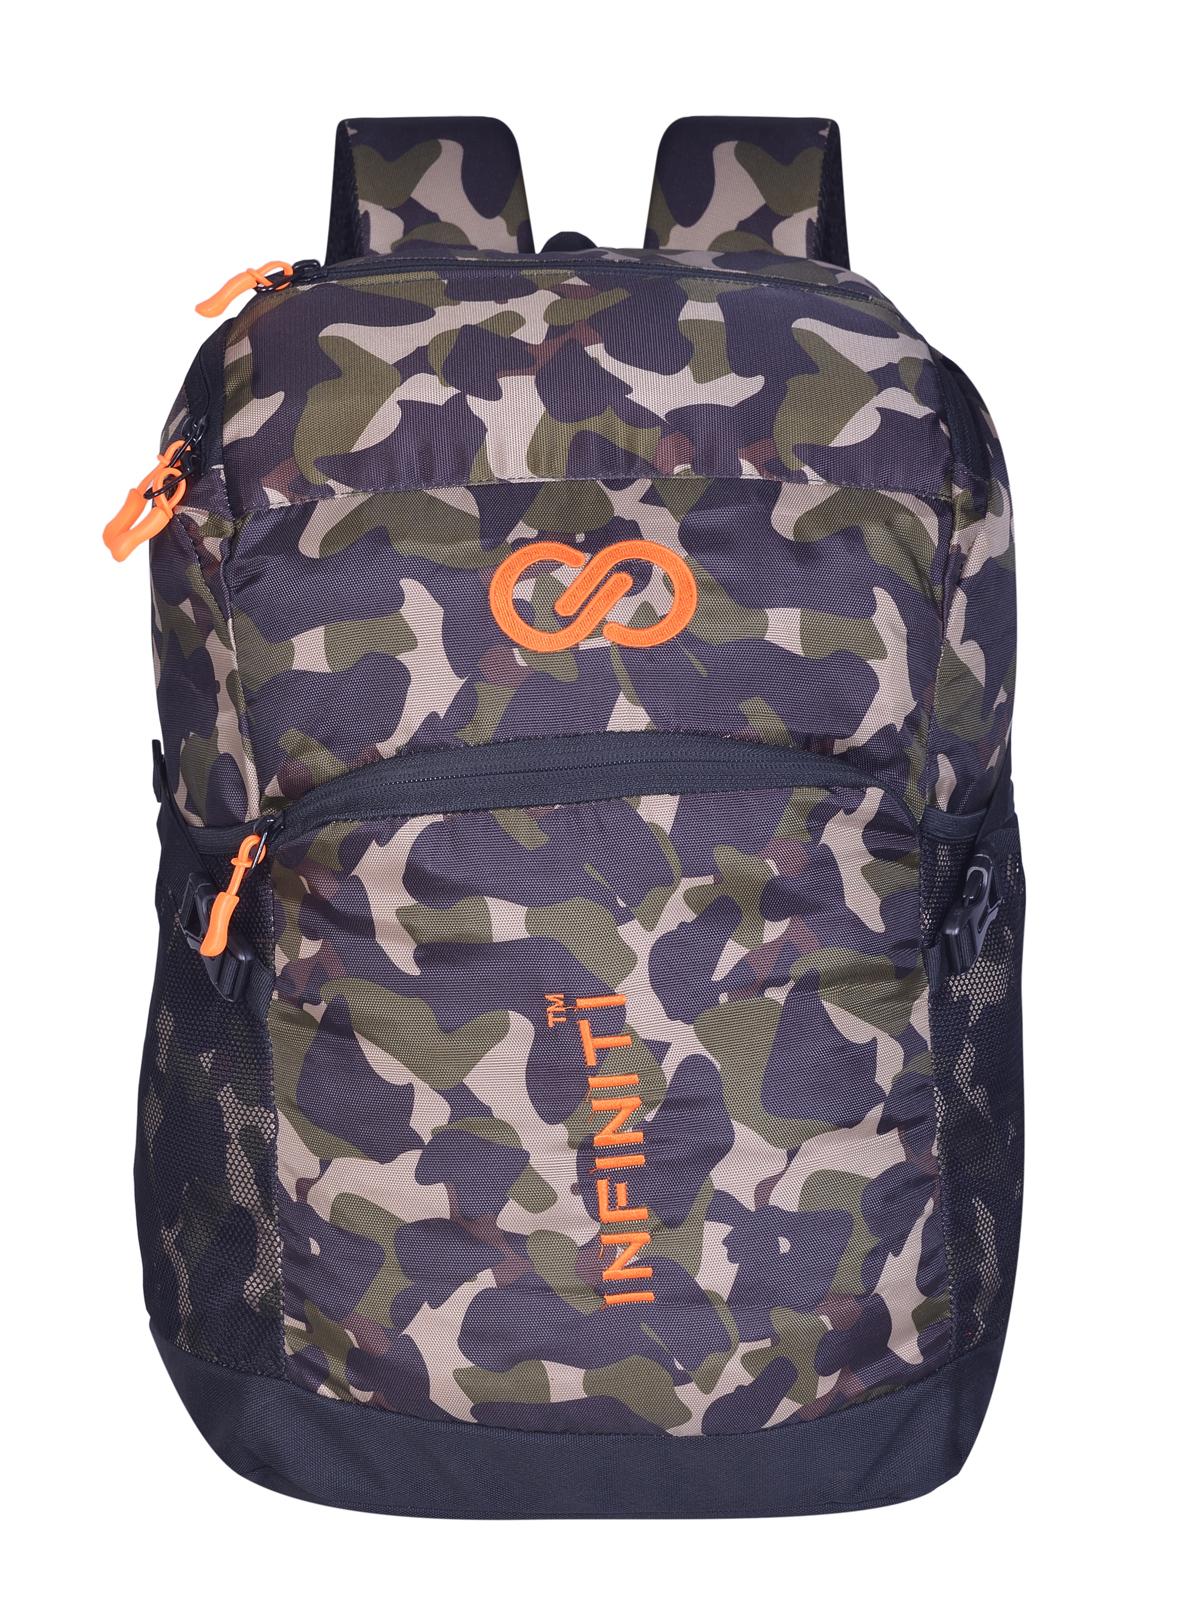 Infiniti | INFINITI - CBP - CREA - Backpack - Green